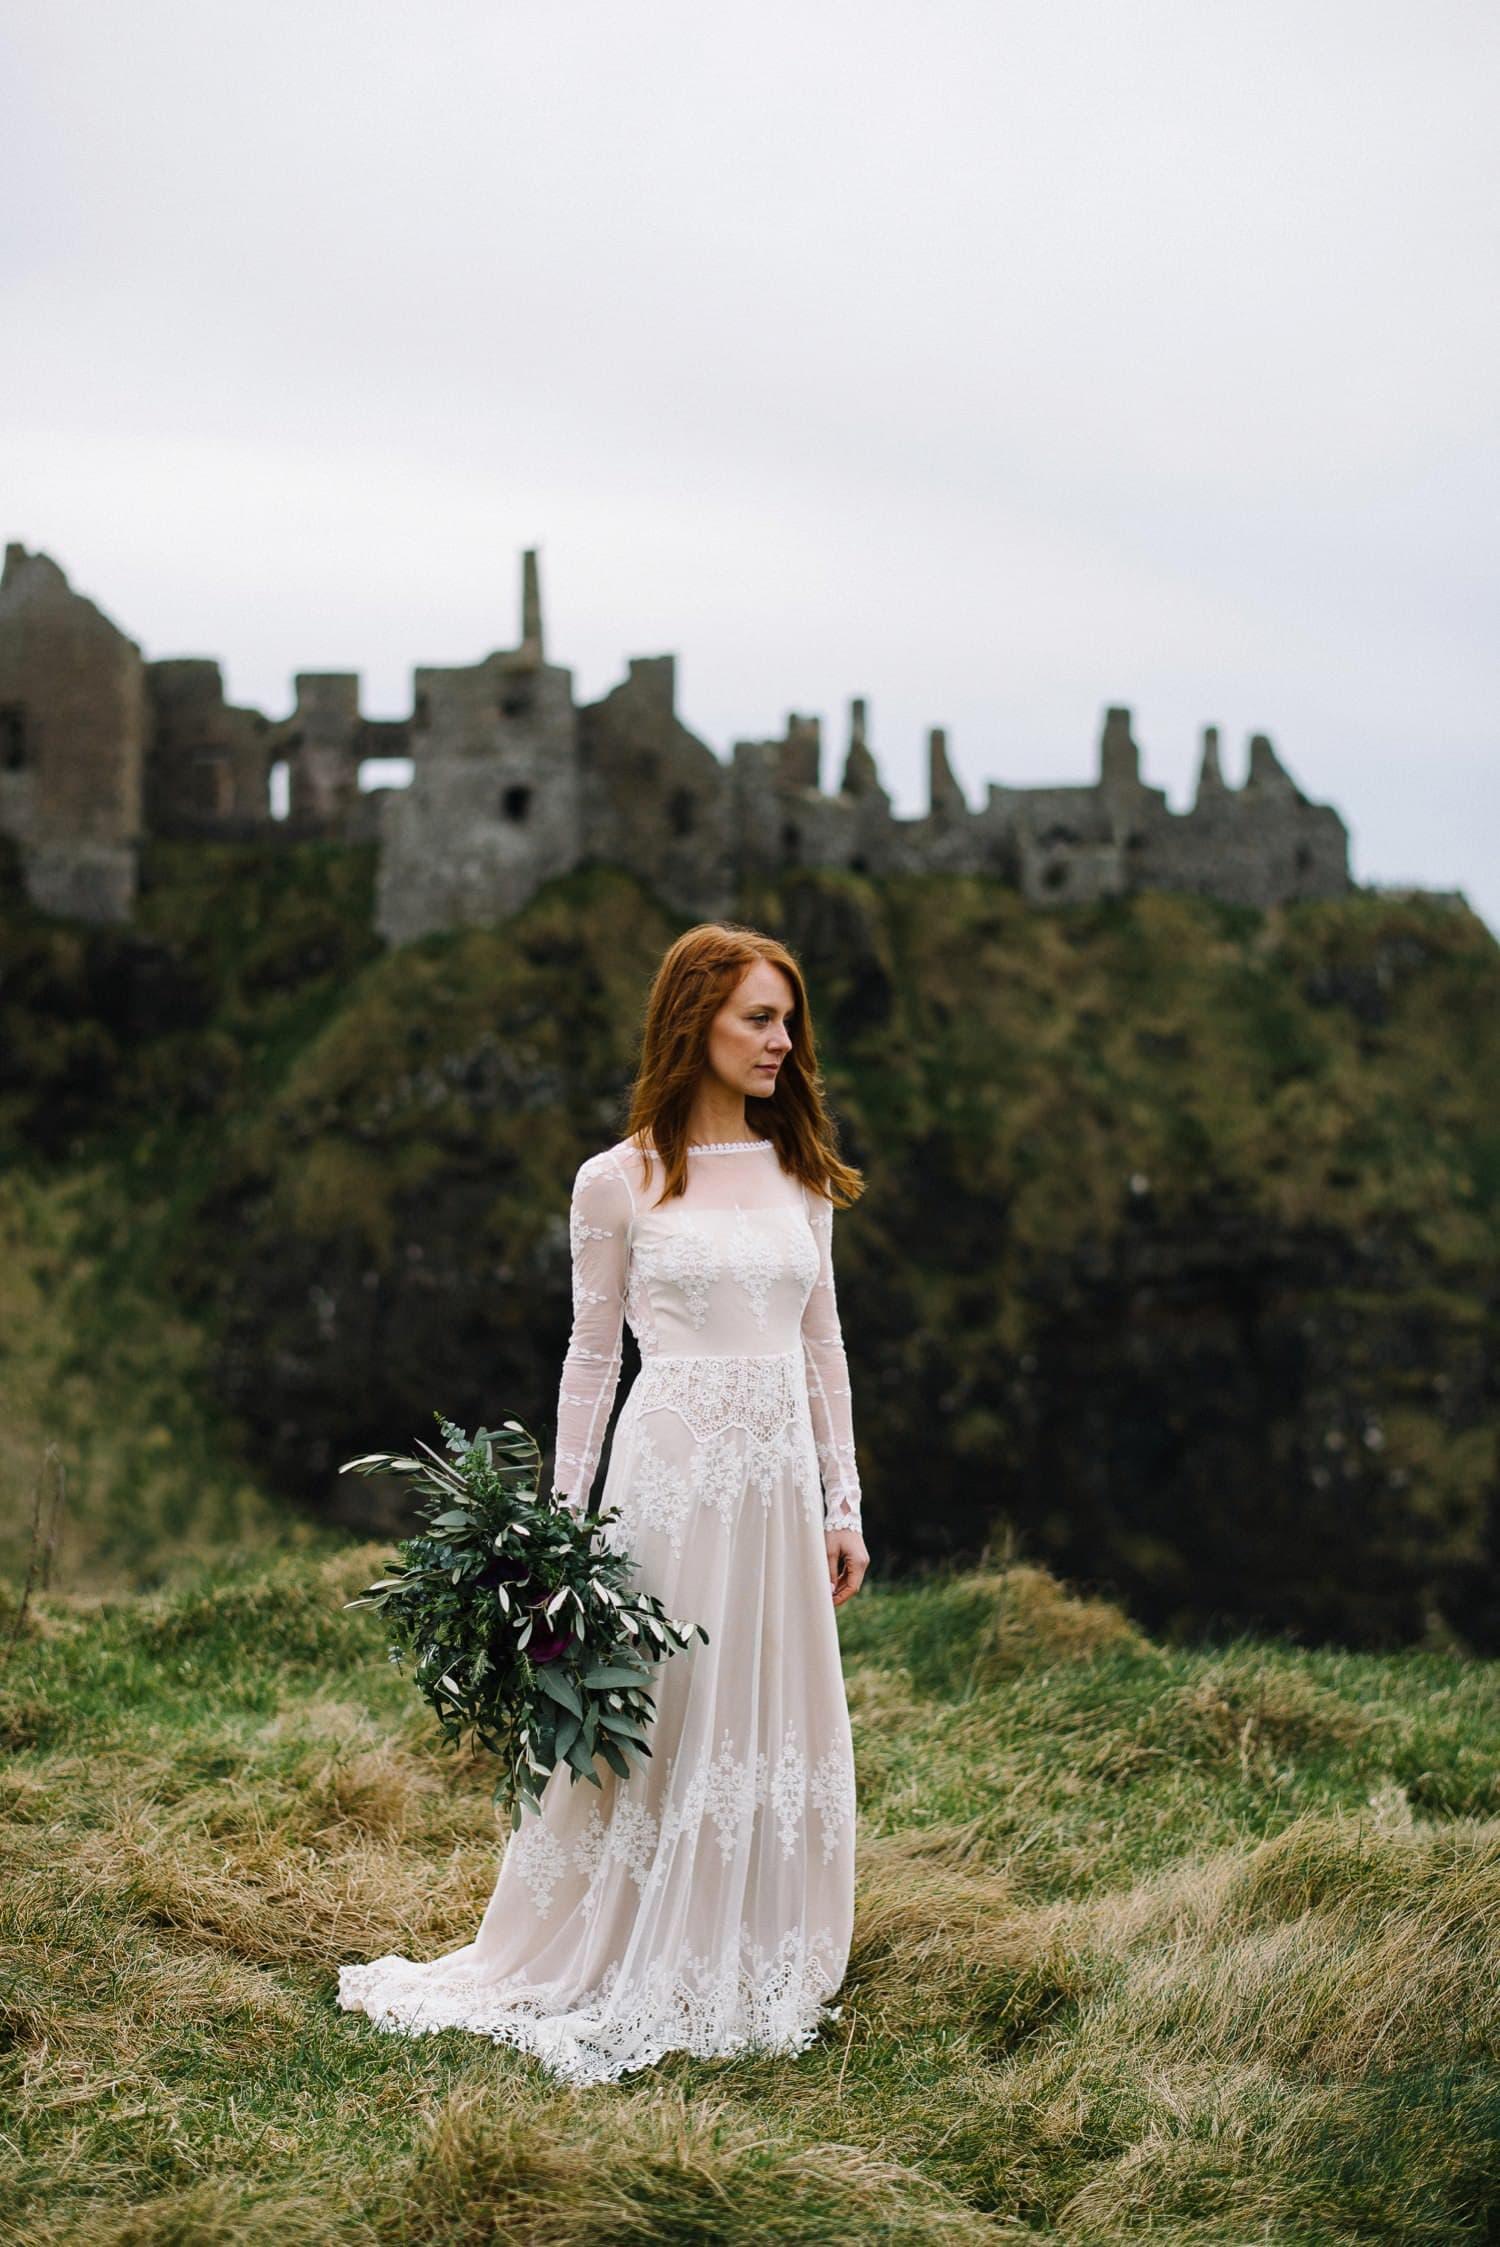 Dunluce Castle Elopement photographer Northern Ireland elopement photography